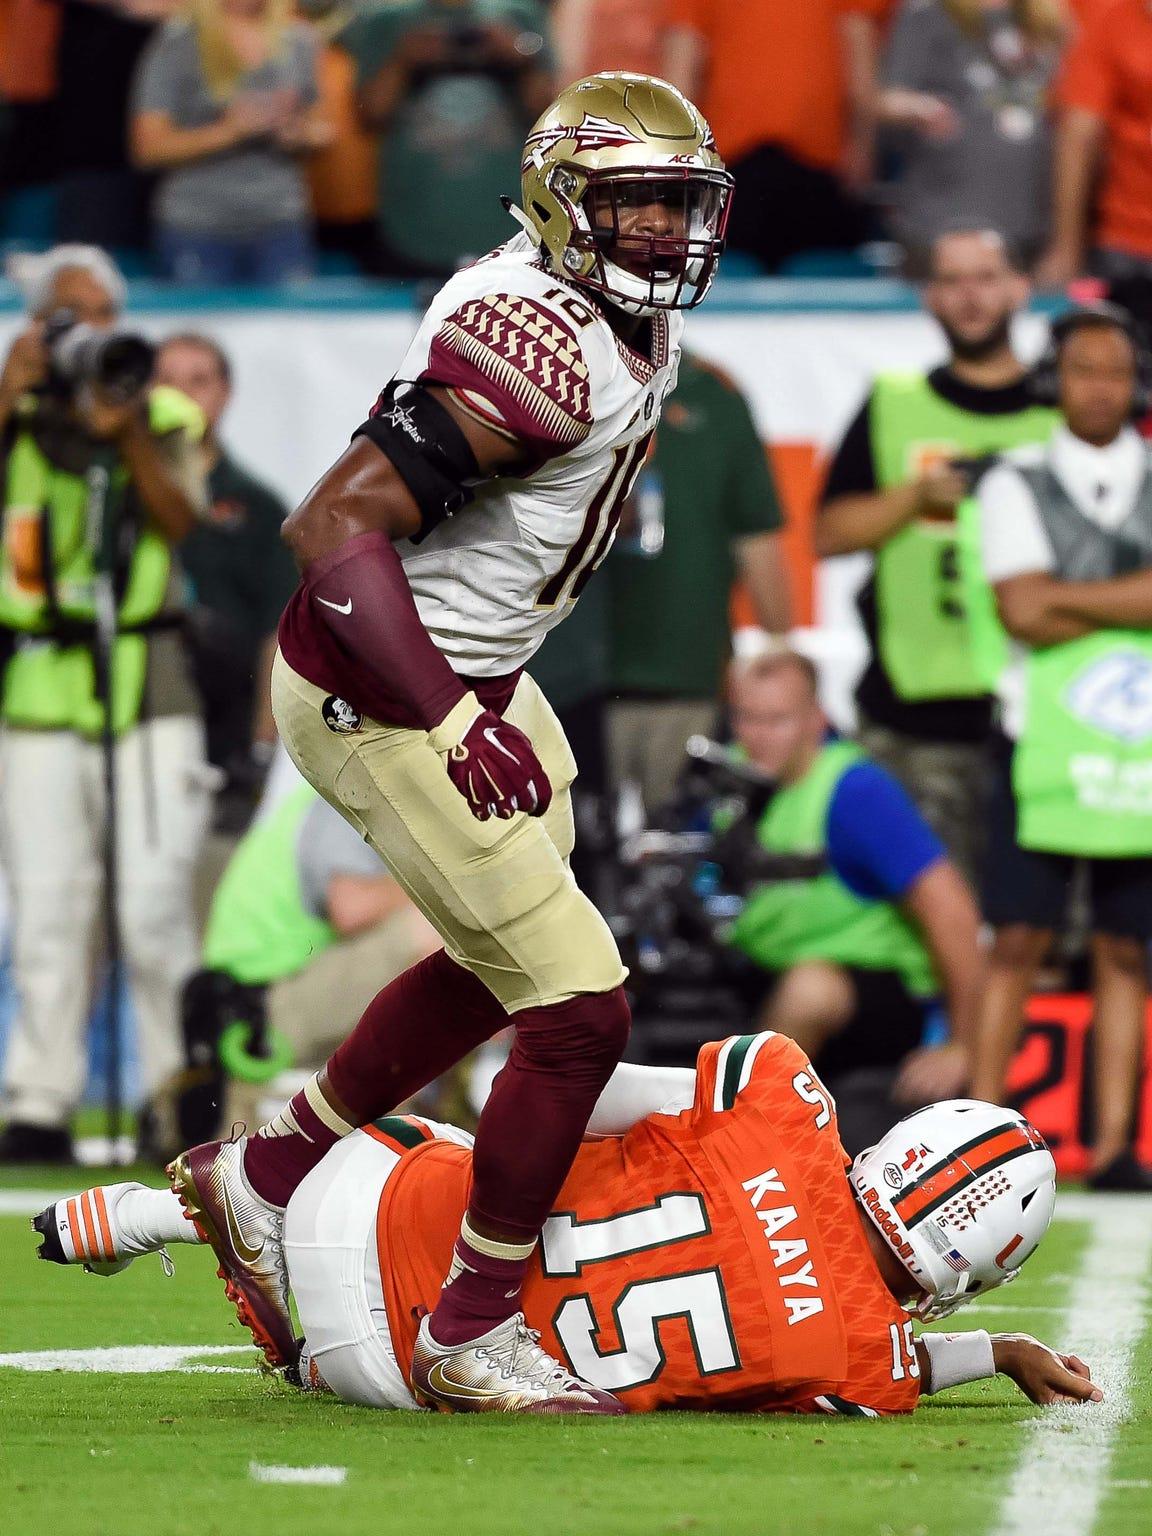 Miami Hurricanes quarterback Brad Kaaya (15) is sacked by Florida State Seminoles linebacker Jacob Pugh (16) during the first half against at Hard Rock Stadium. FSU had three sacks against Miami.